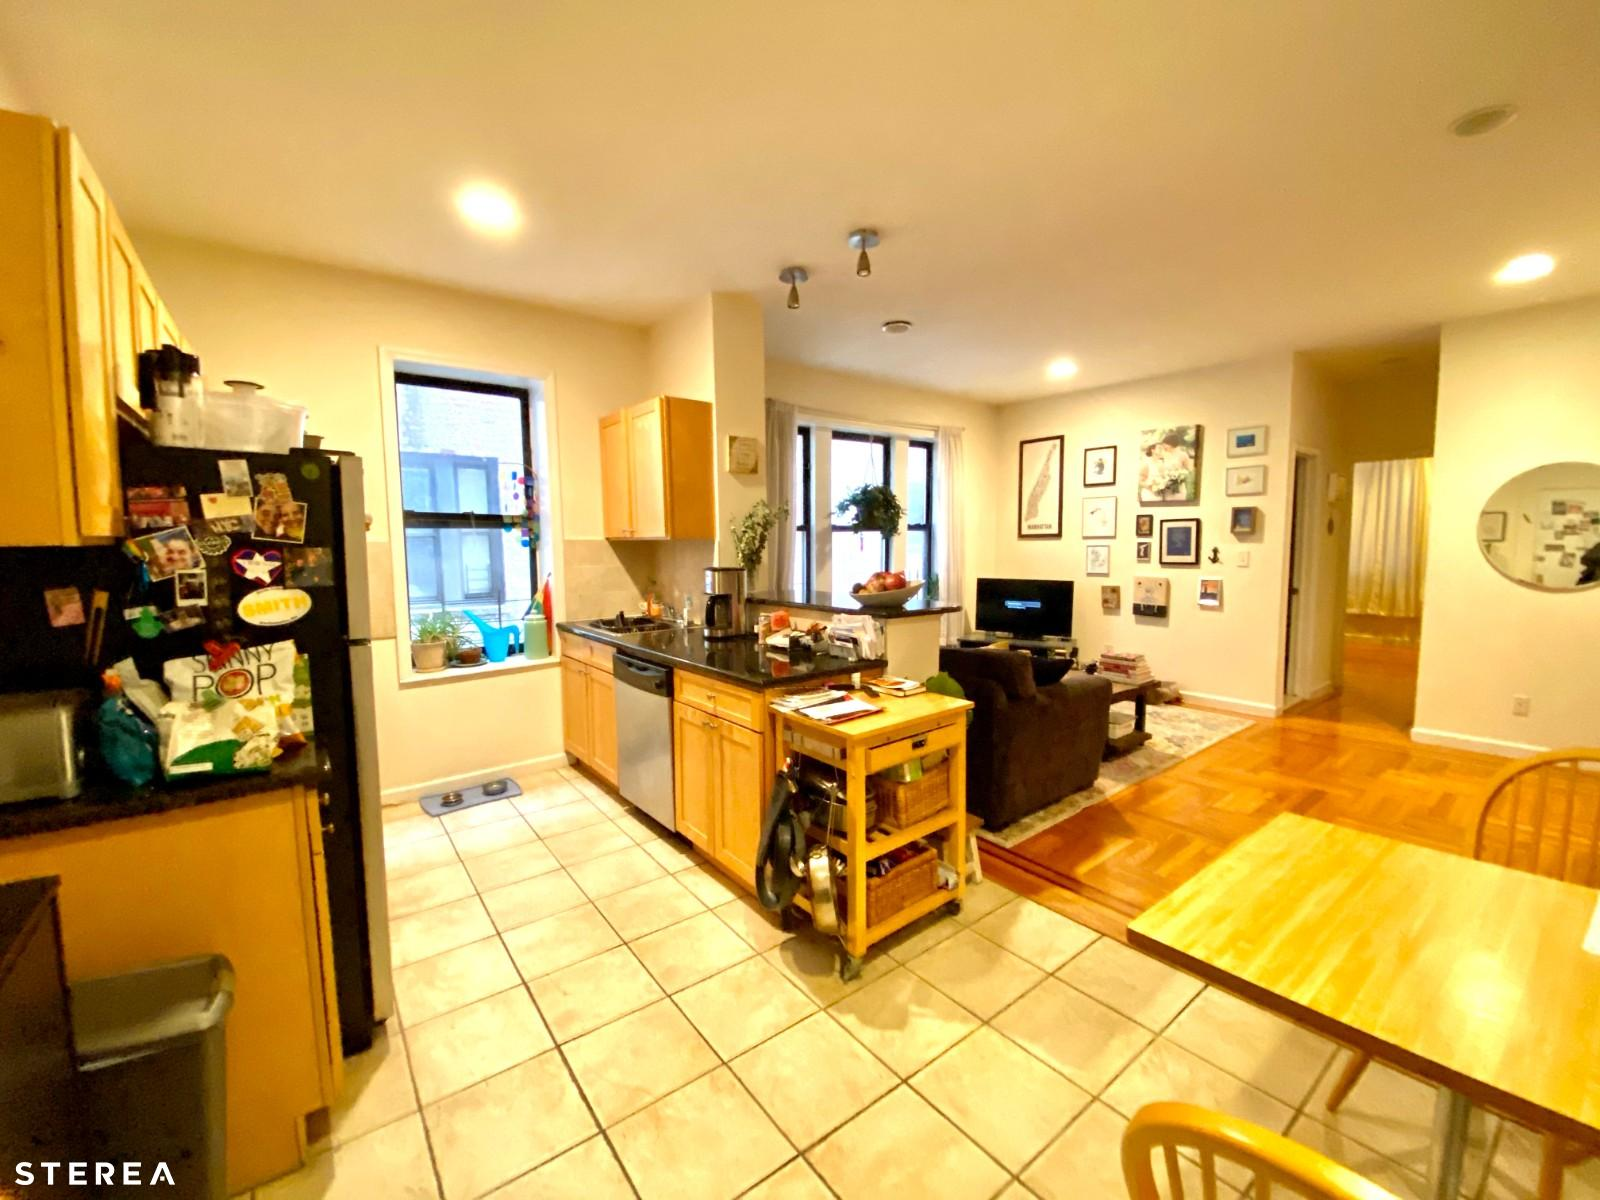 29 06 21st Ave 2e Astoria Ny 11105 Astoria Apartments Astoria 1 Bedroom Apartment For Rent